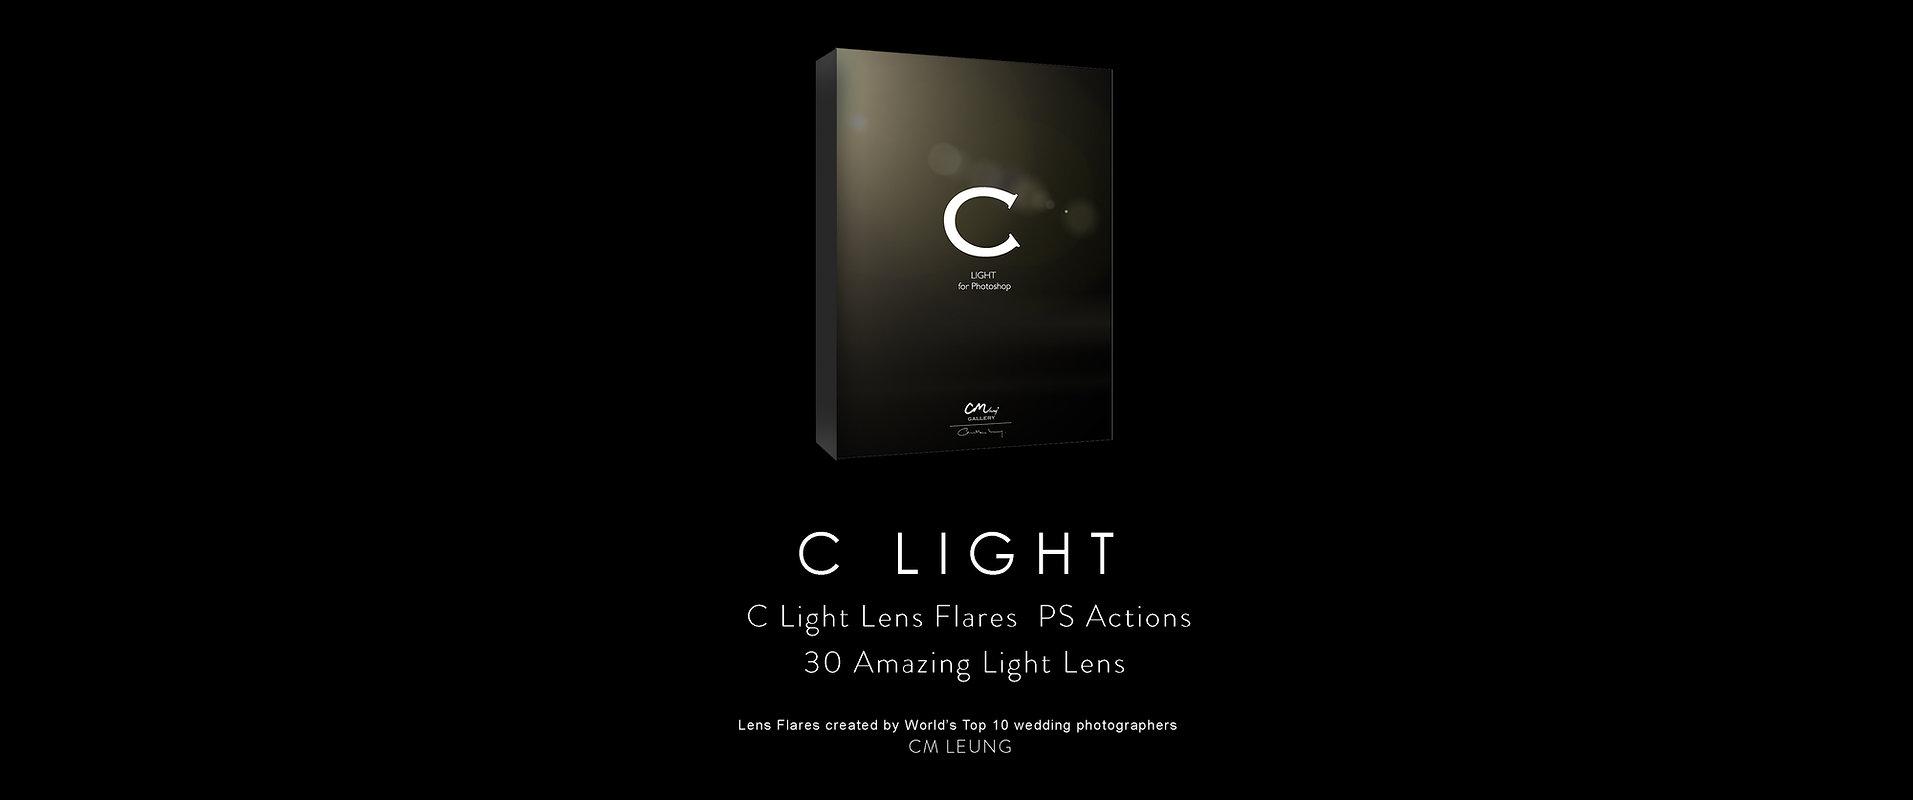 clightcover.jpg